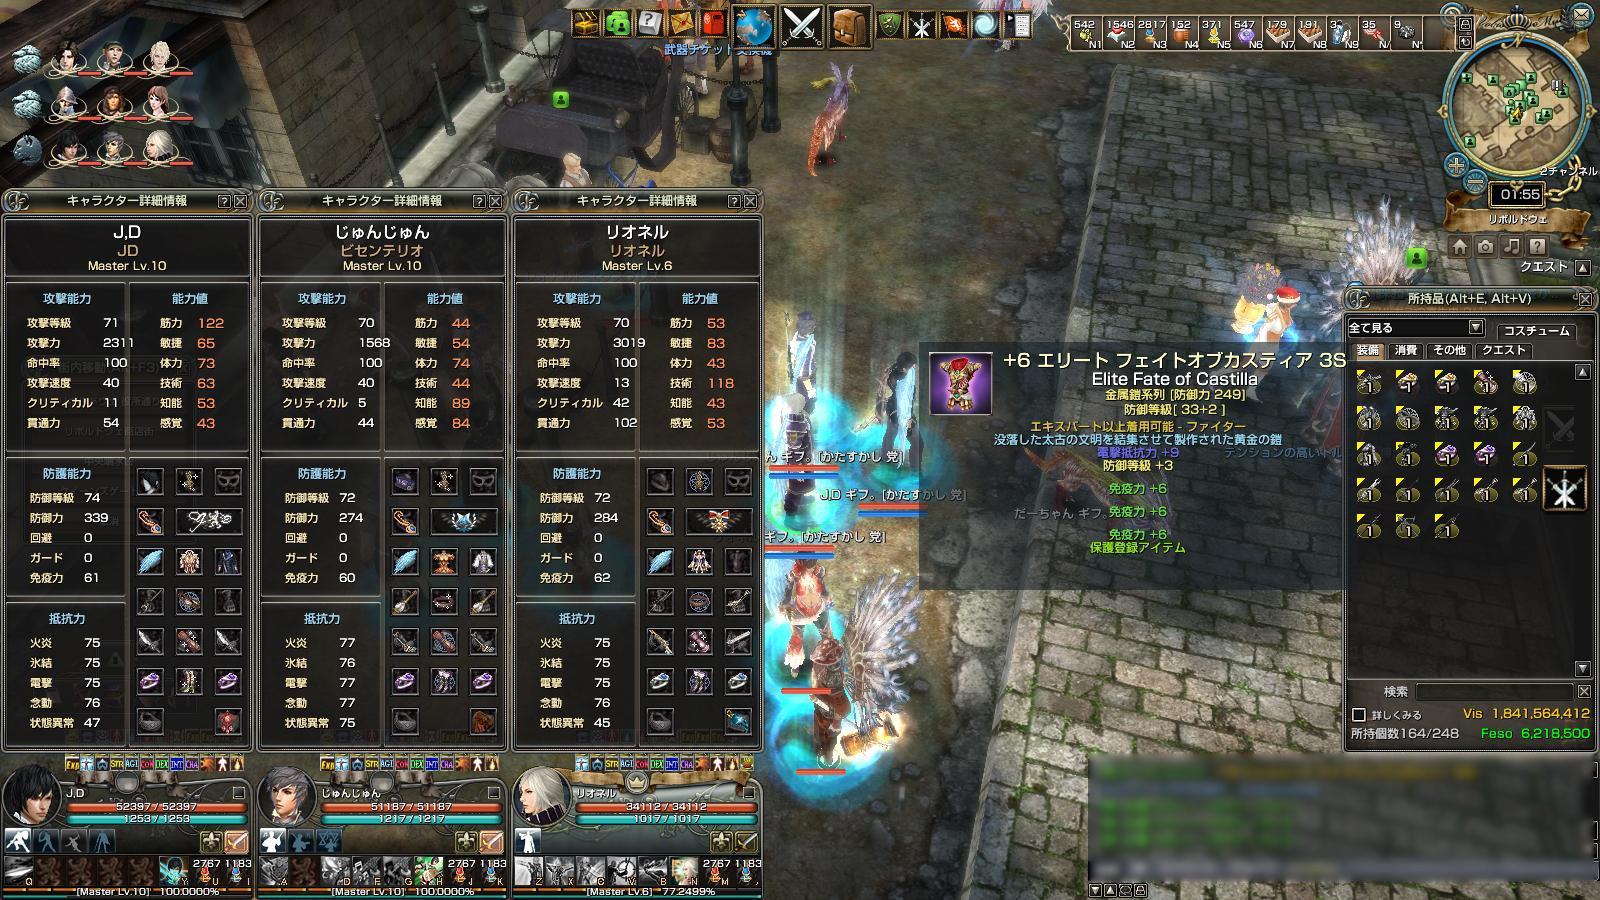 capture_20130824_015537_777.jpg